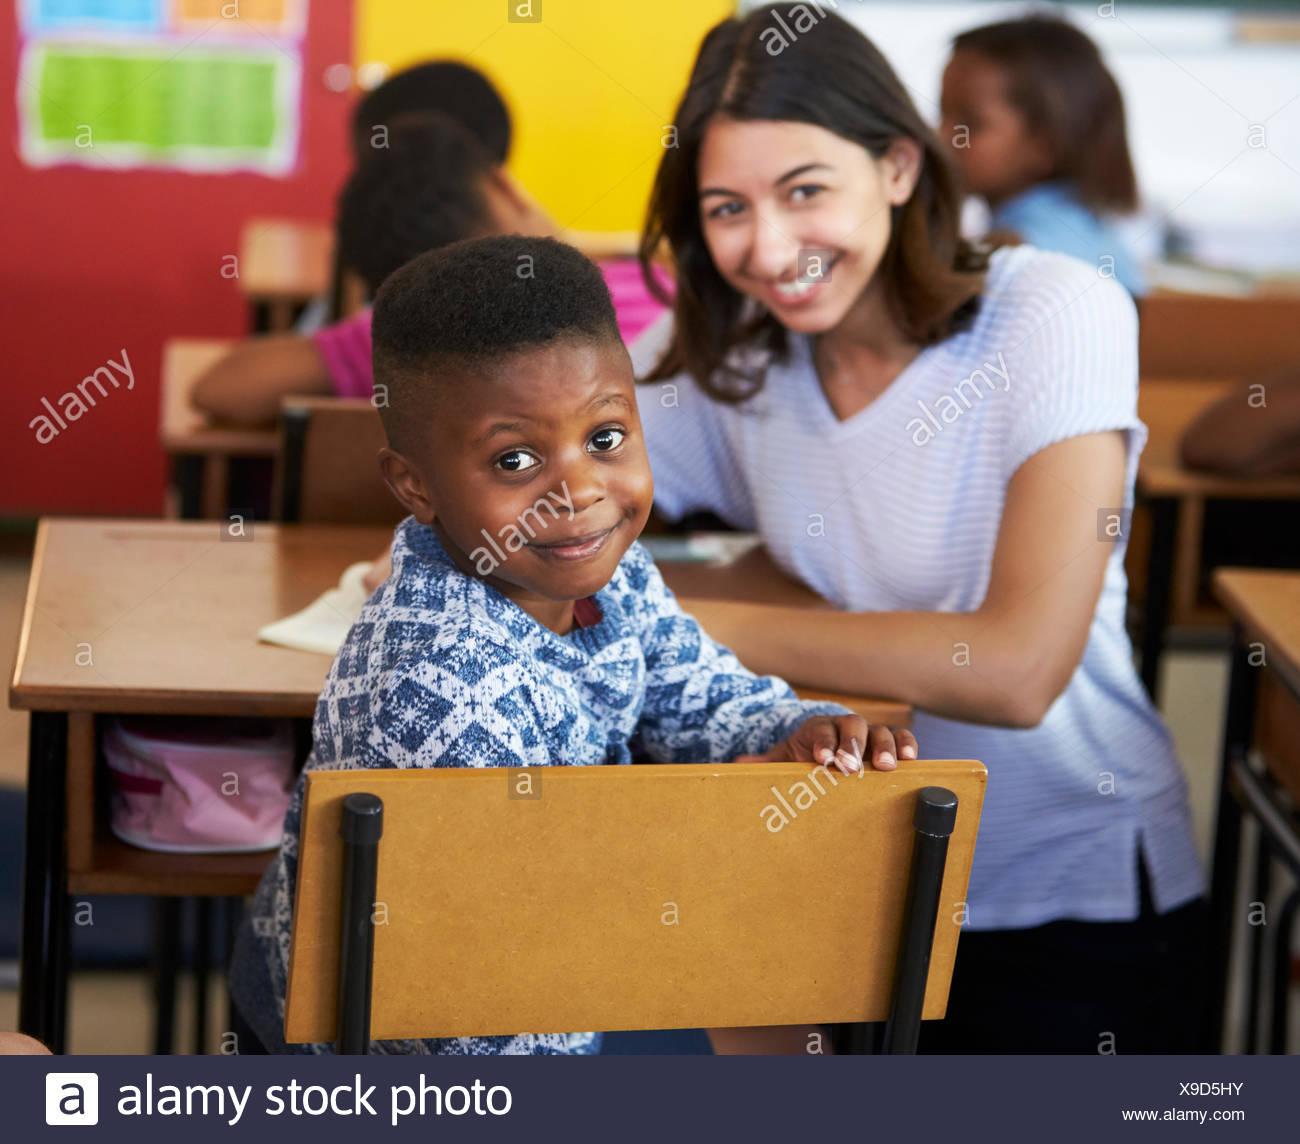 Female Volunteer teacher and elementary school boy smiling to camera - Stock Image